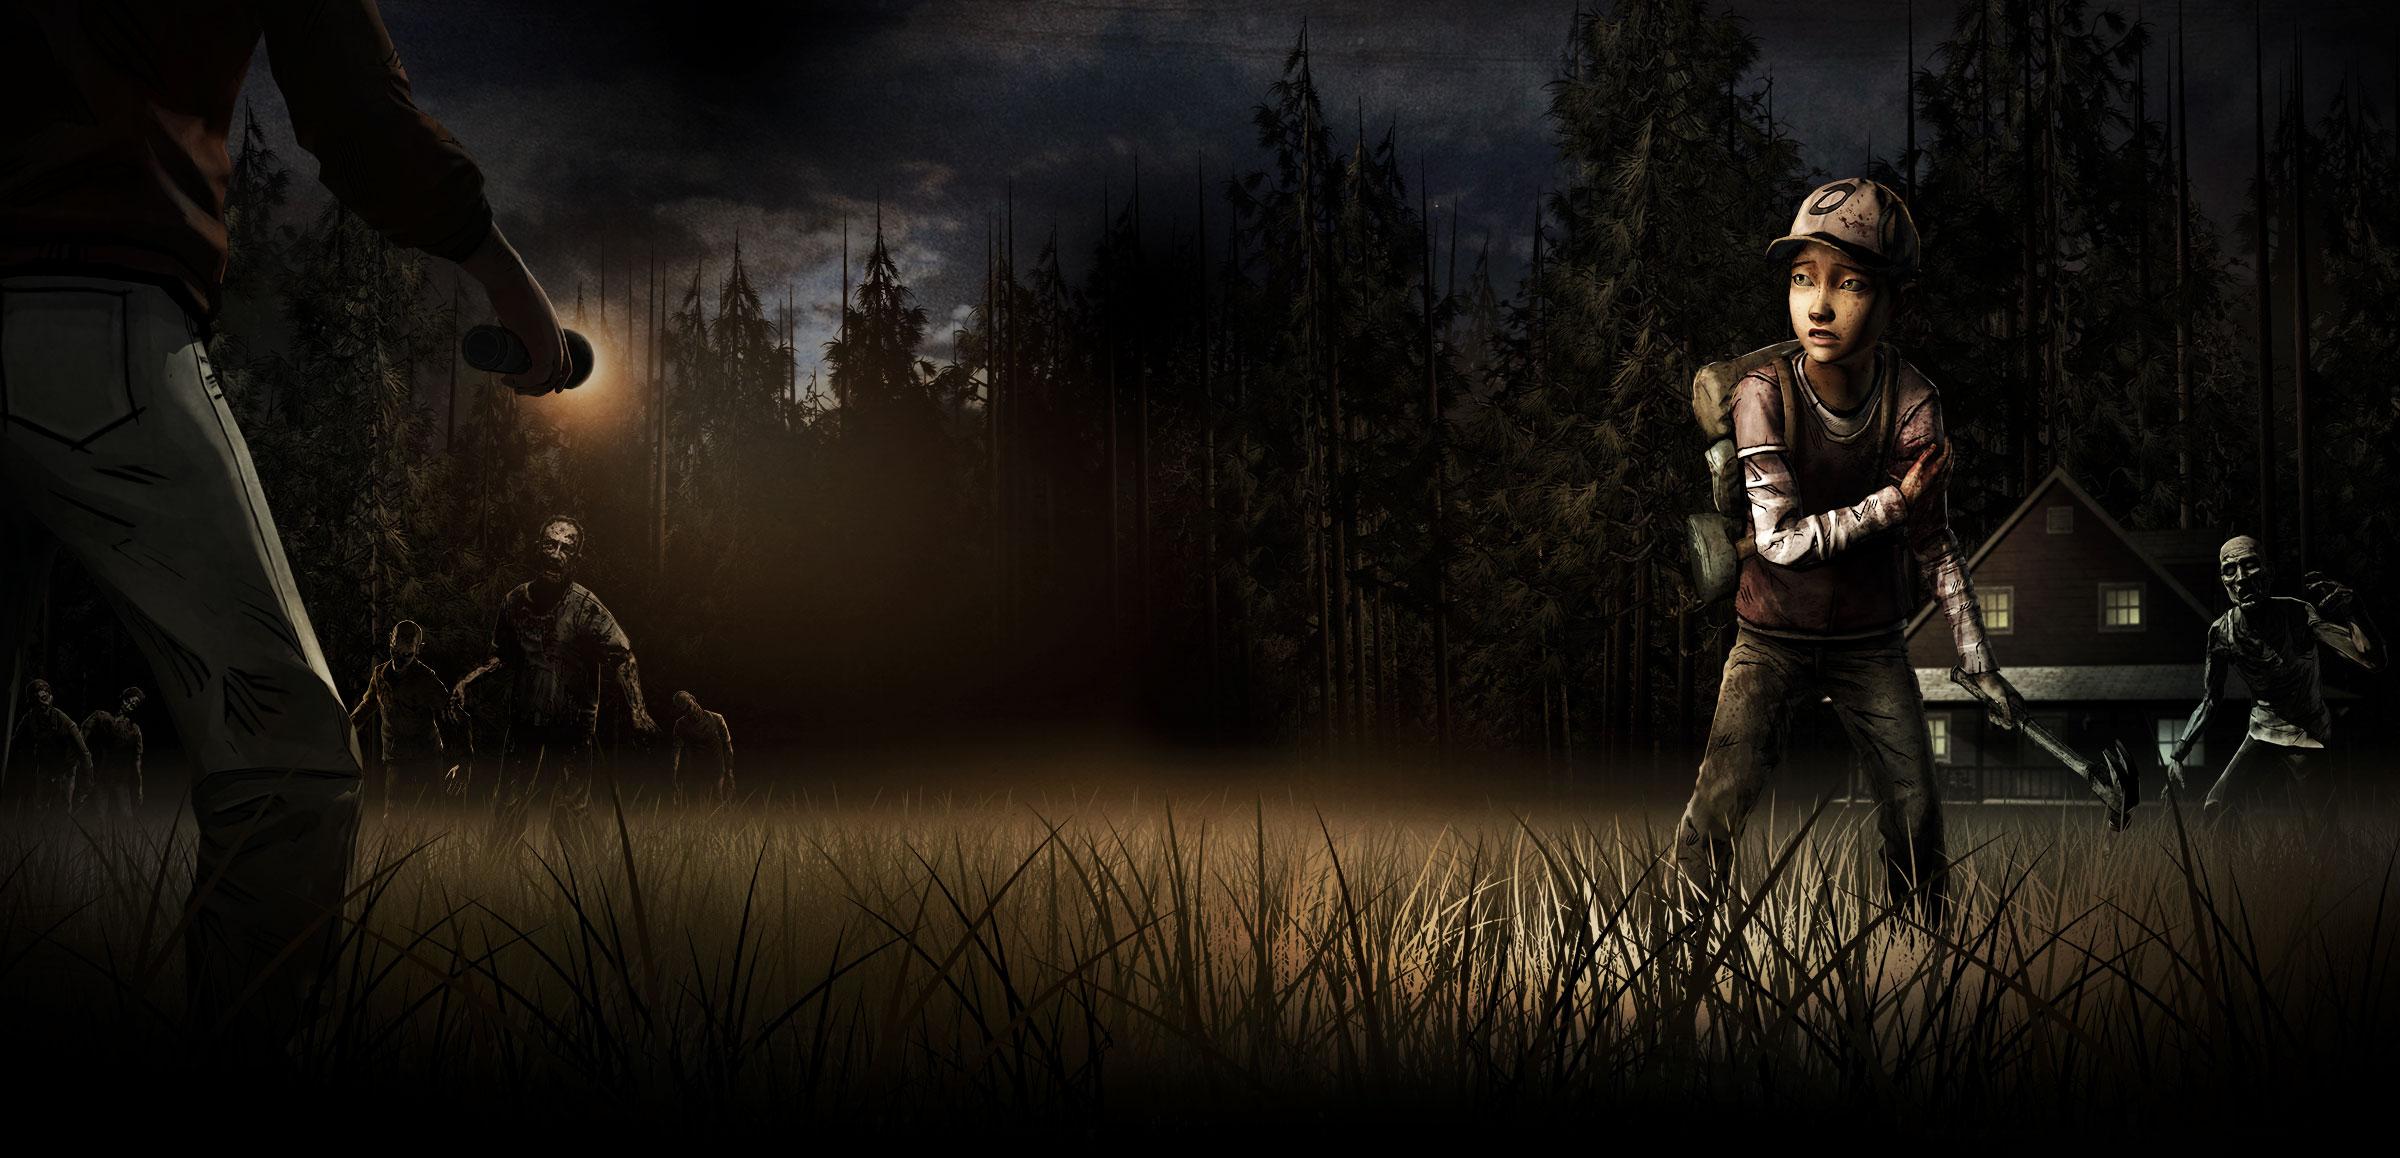 1000+ images about The Walking Dead on Pinterest | Walking dead